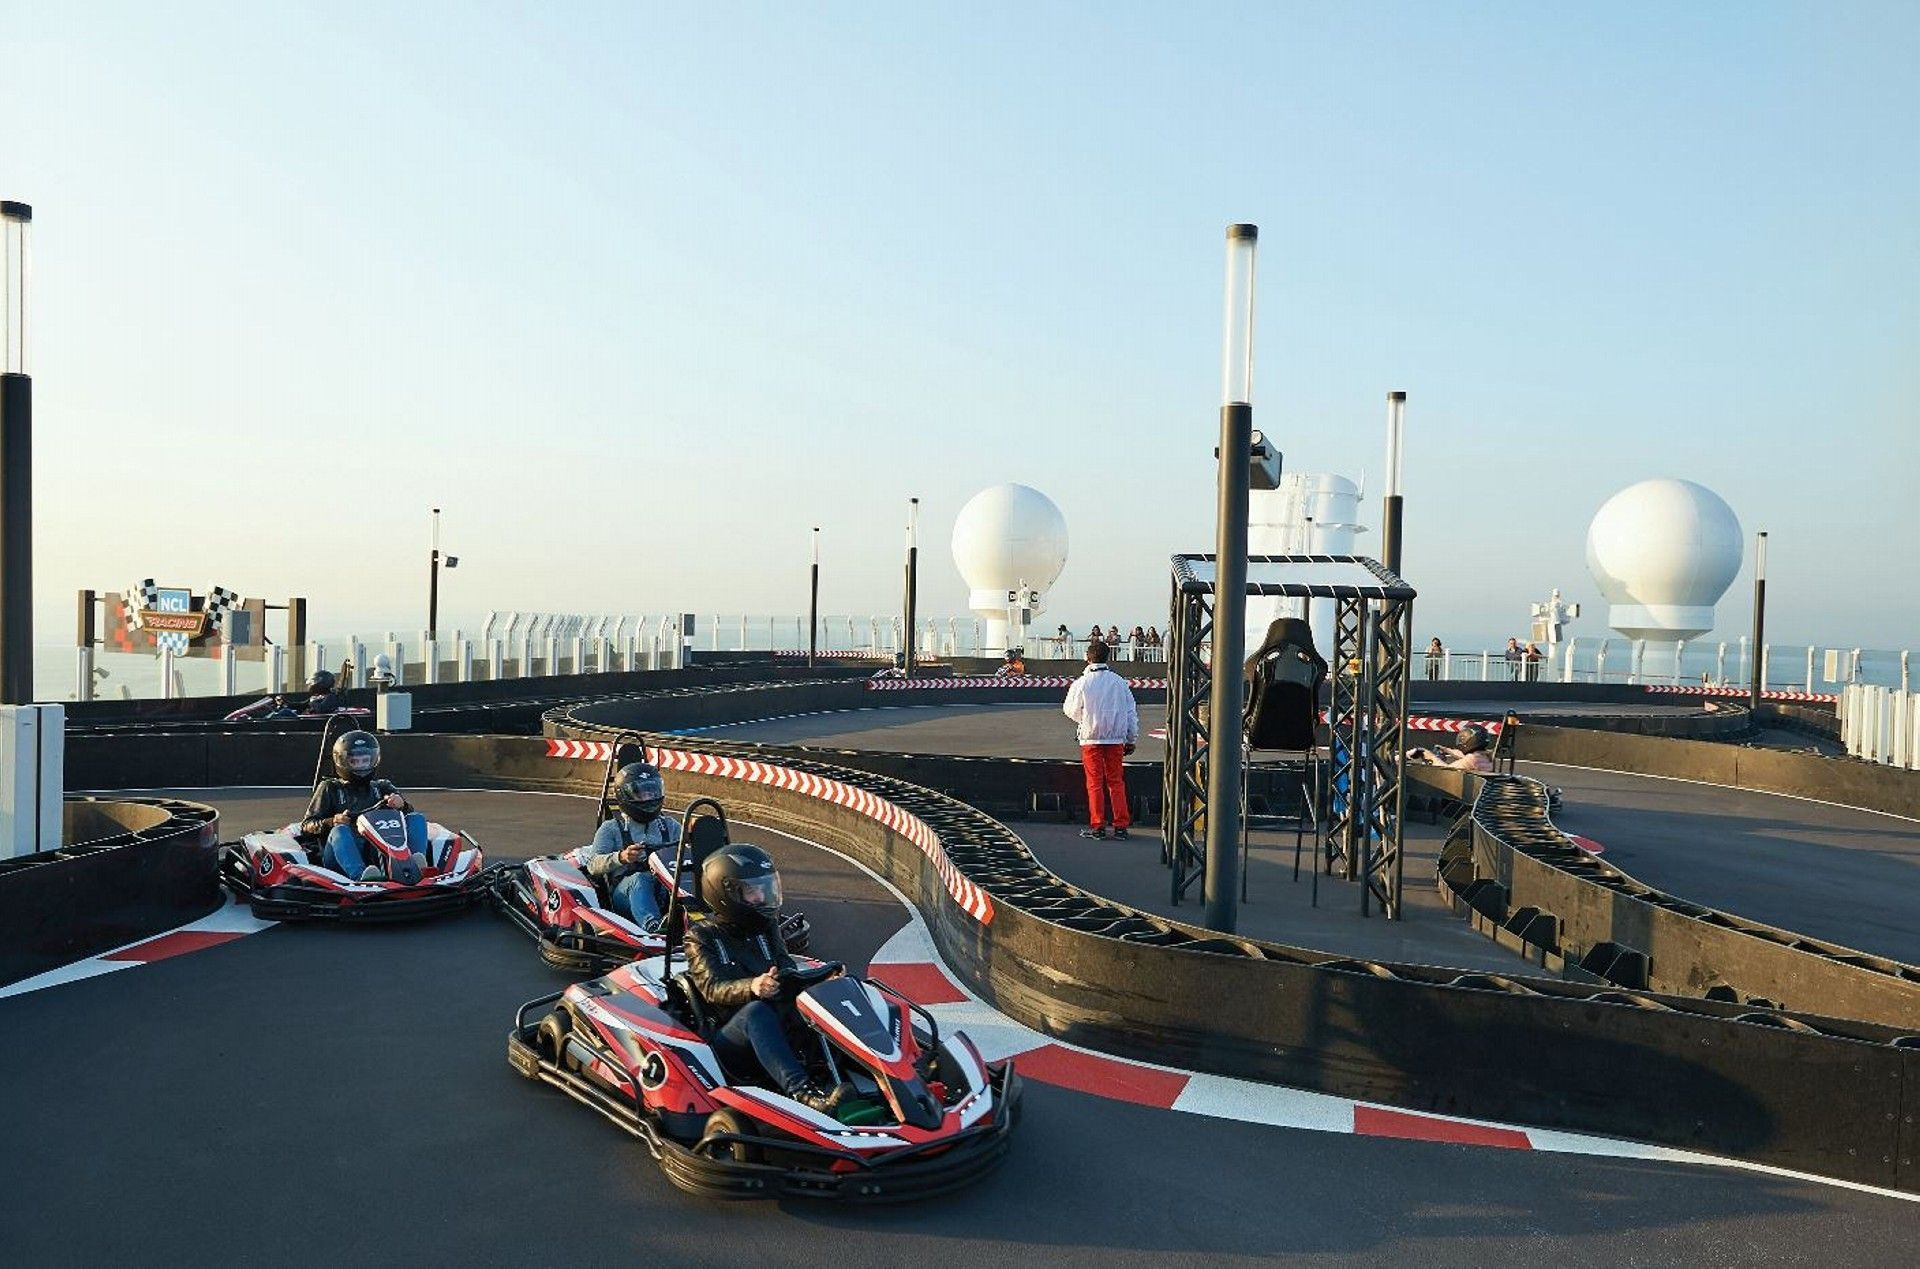 Karting Crucero (2)